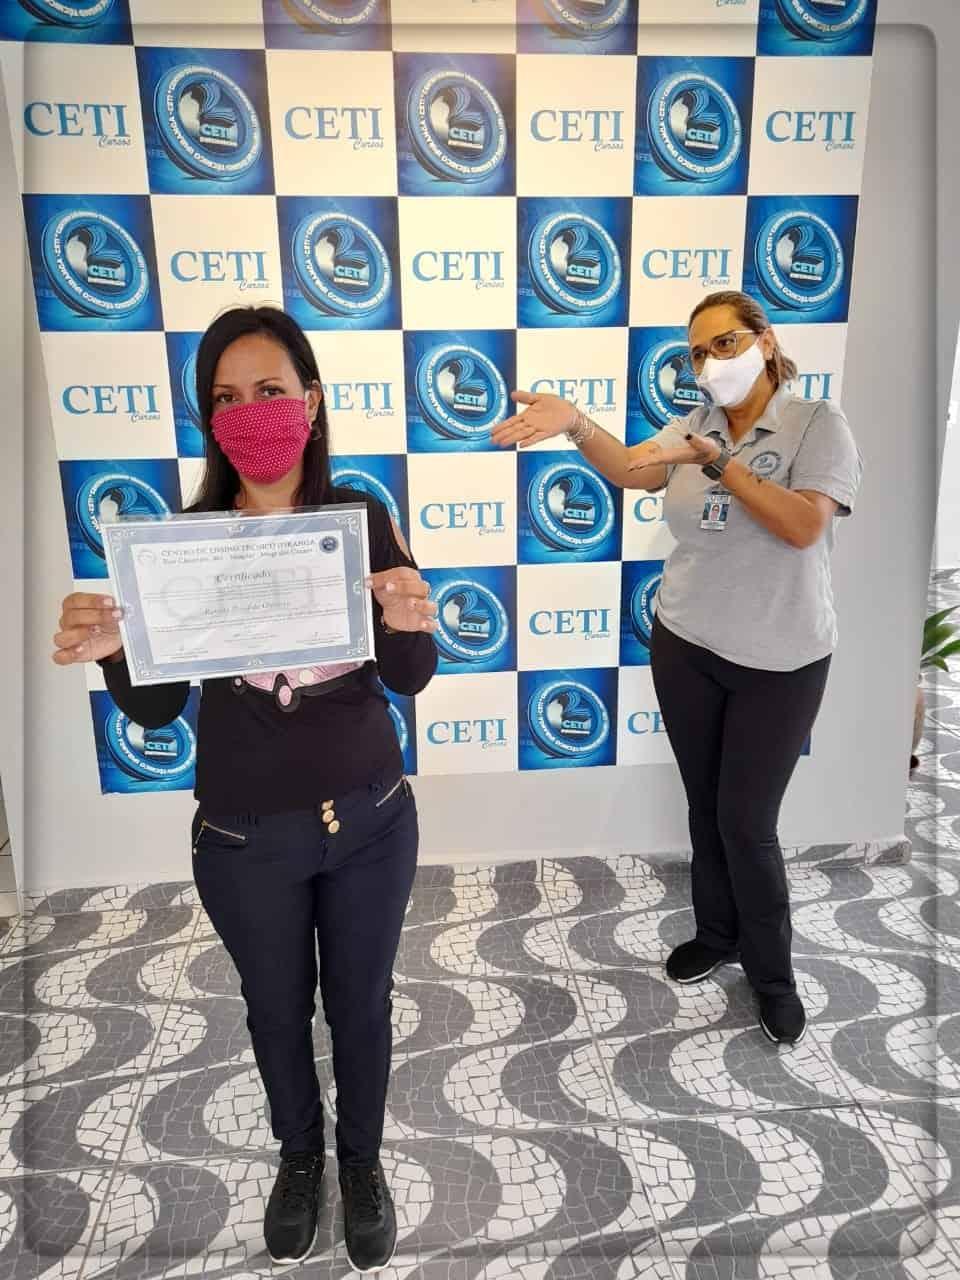 Certificado - RENATA ROSA DE OLIVEIRA